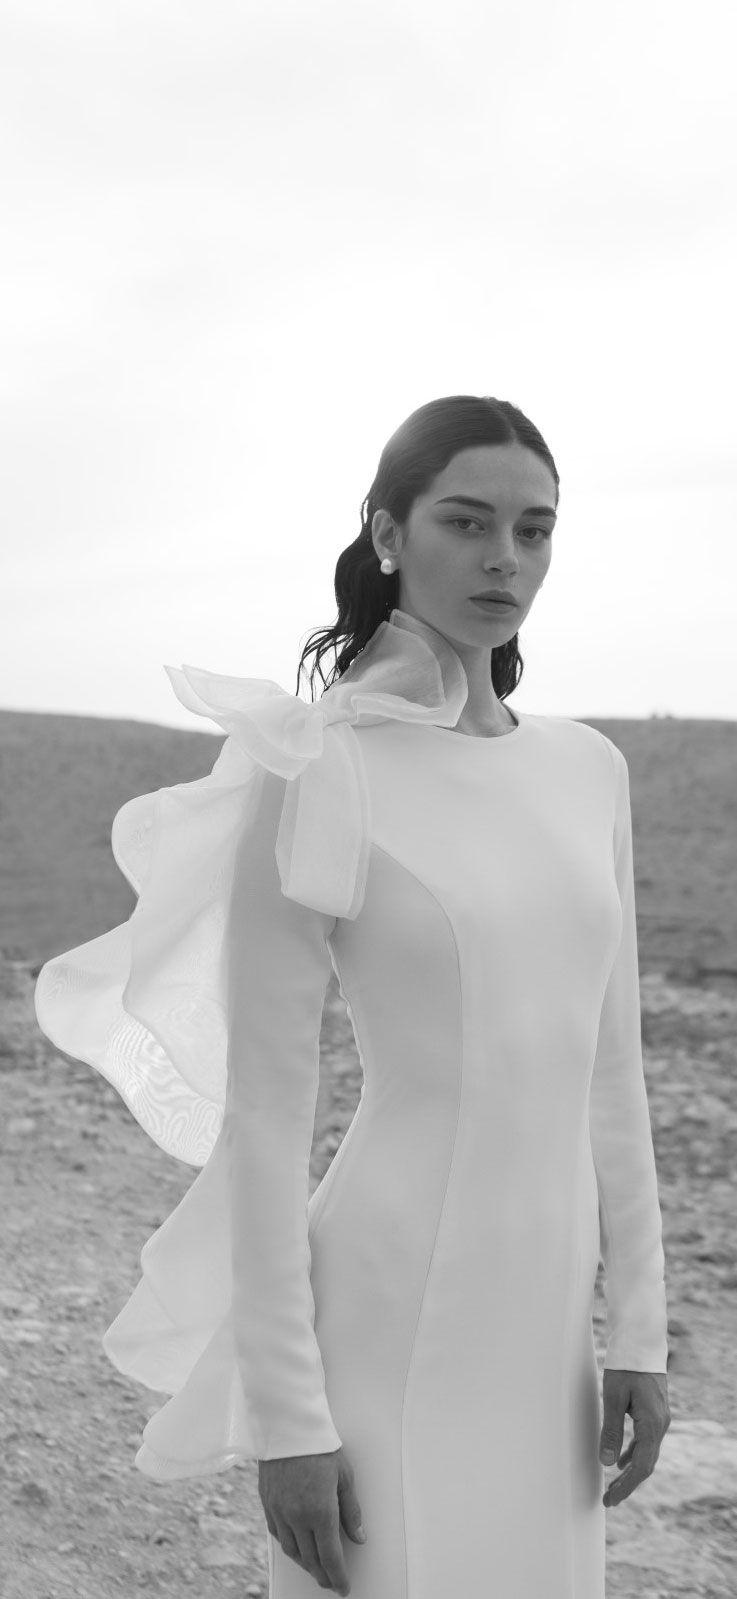 Special Bridal Editorial By Livné White 2019 Bridal Collection, 'Eden'